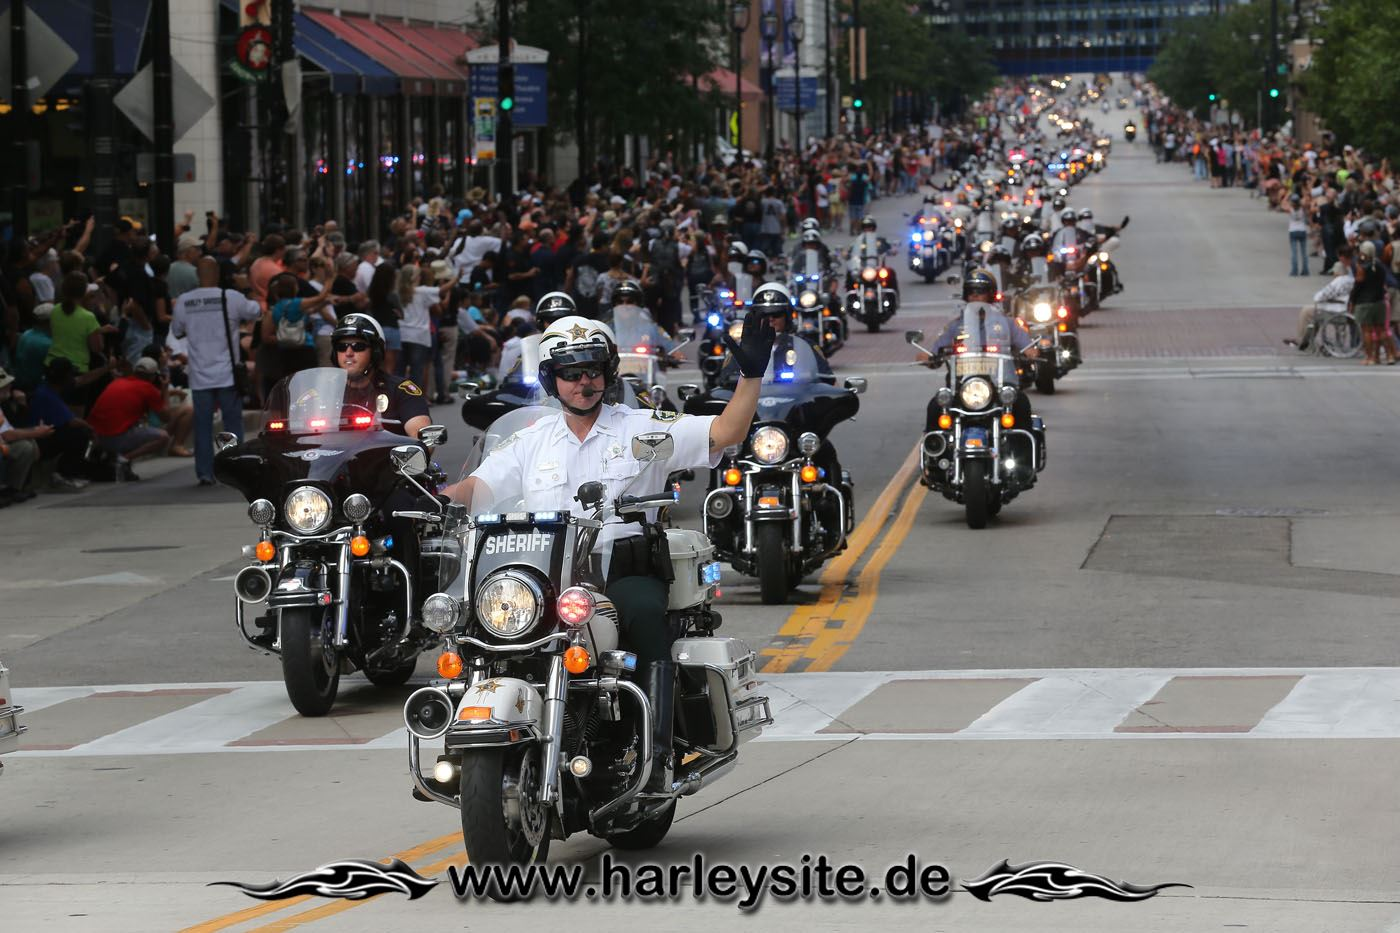 29HD13 110th Event Milwaukee 18